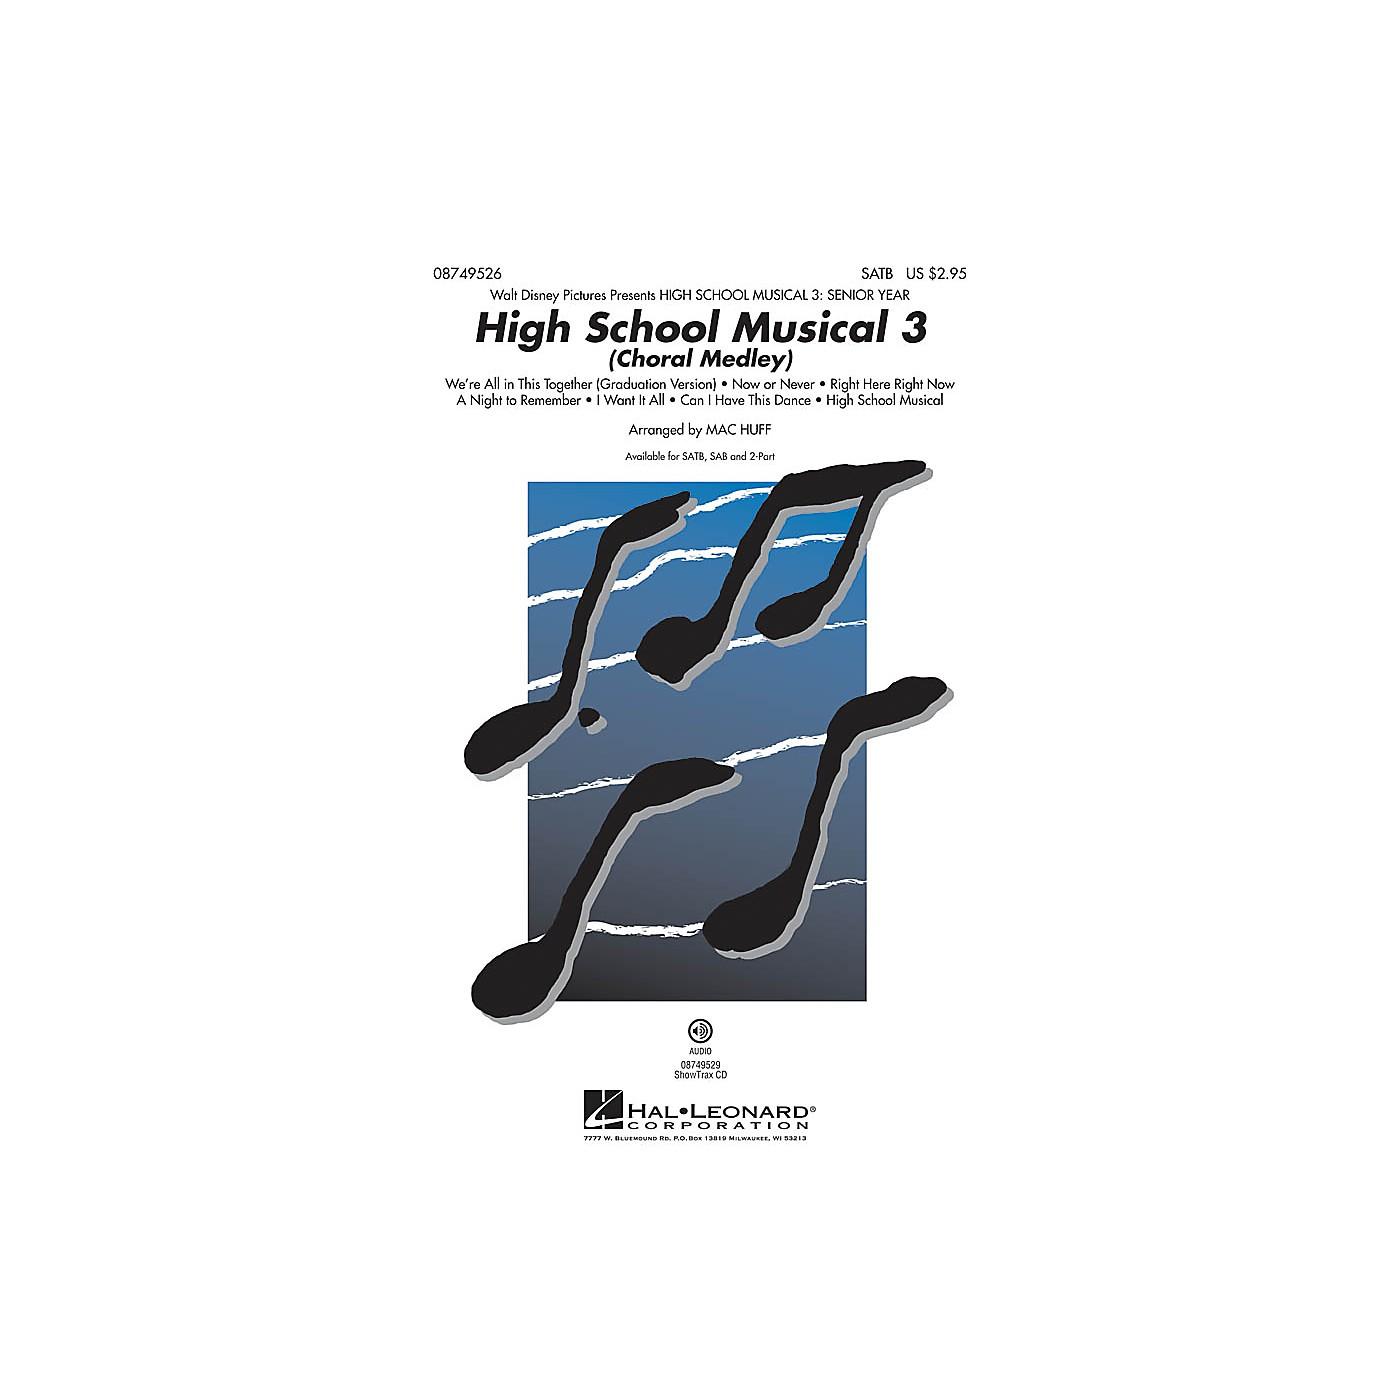 Hal Leonard High School Musical 3 (Choral Medley) SATB arranged by Mac Huff thumbnail